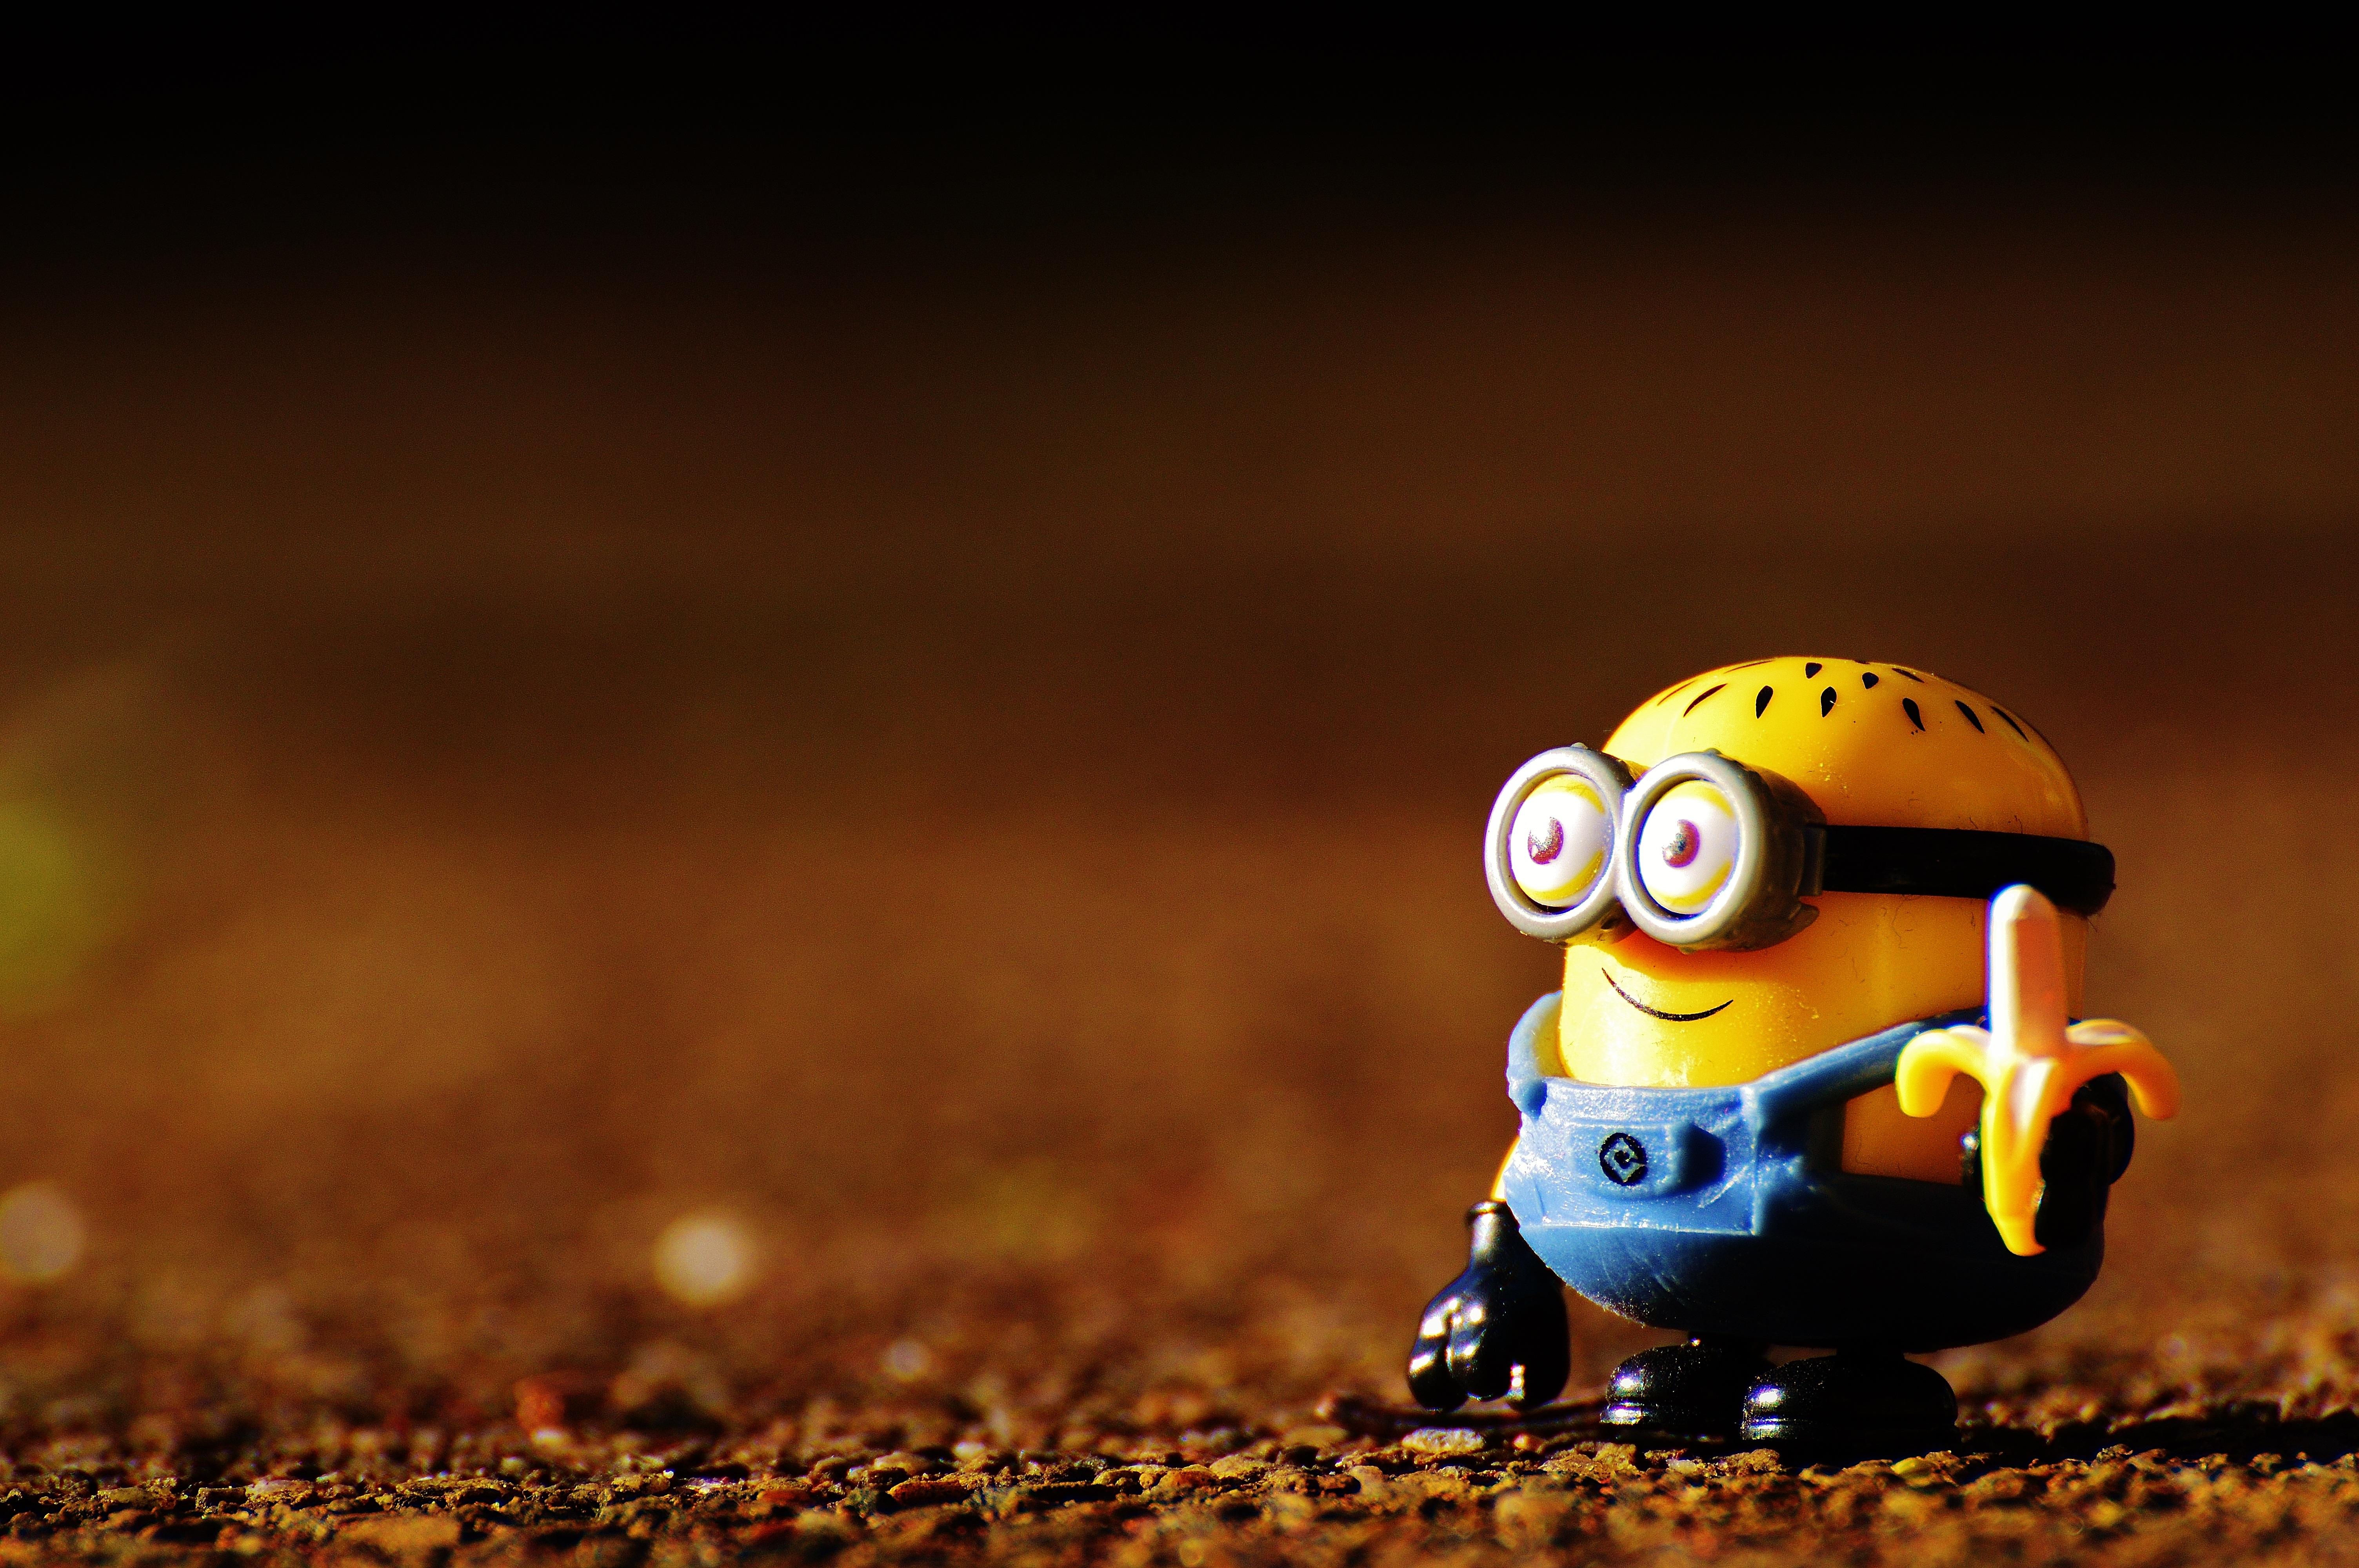 Beautiful Wallpaper Night Cute - night-sweet-cute-yellow-banana-toy-children-figure-toys-funny-minion-screenshot-macro-photography-computer-wallpaper-824962  Pictures.jpg